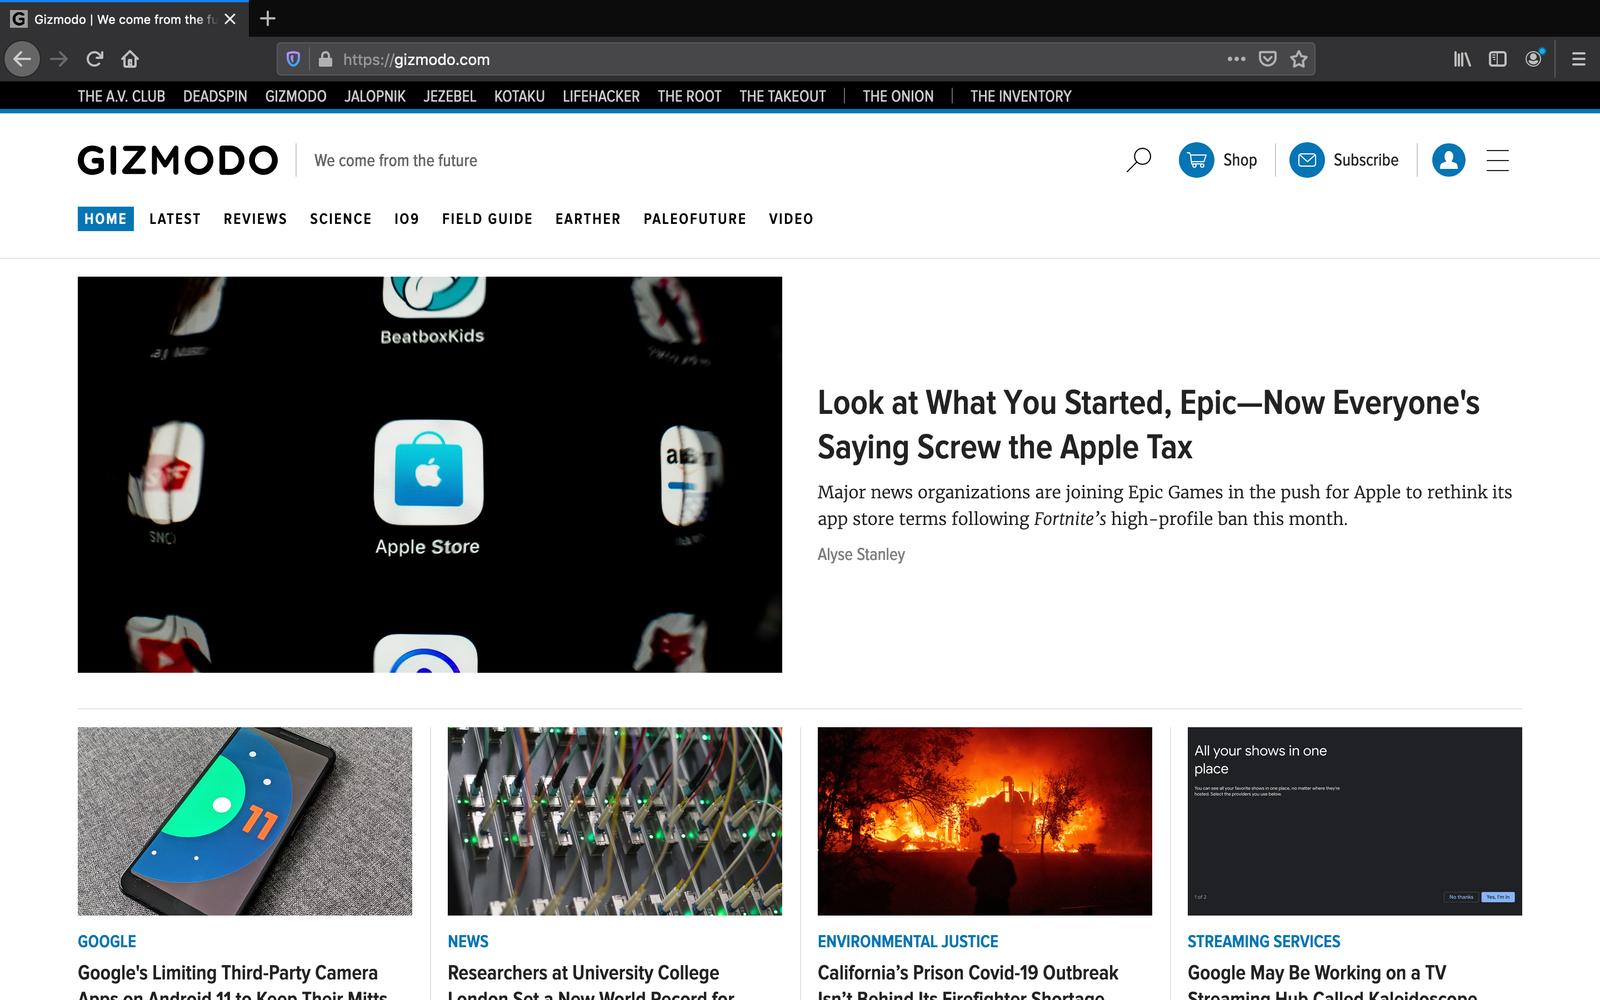 Firefox: Look, mom, no ads!